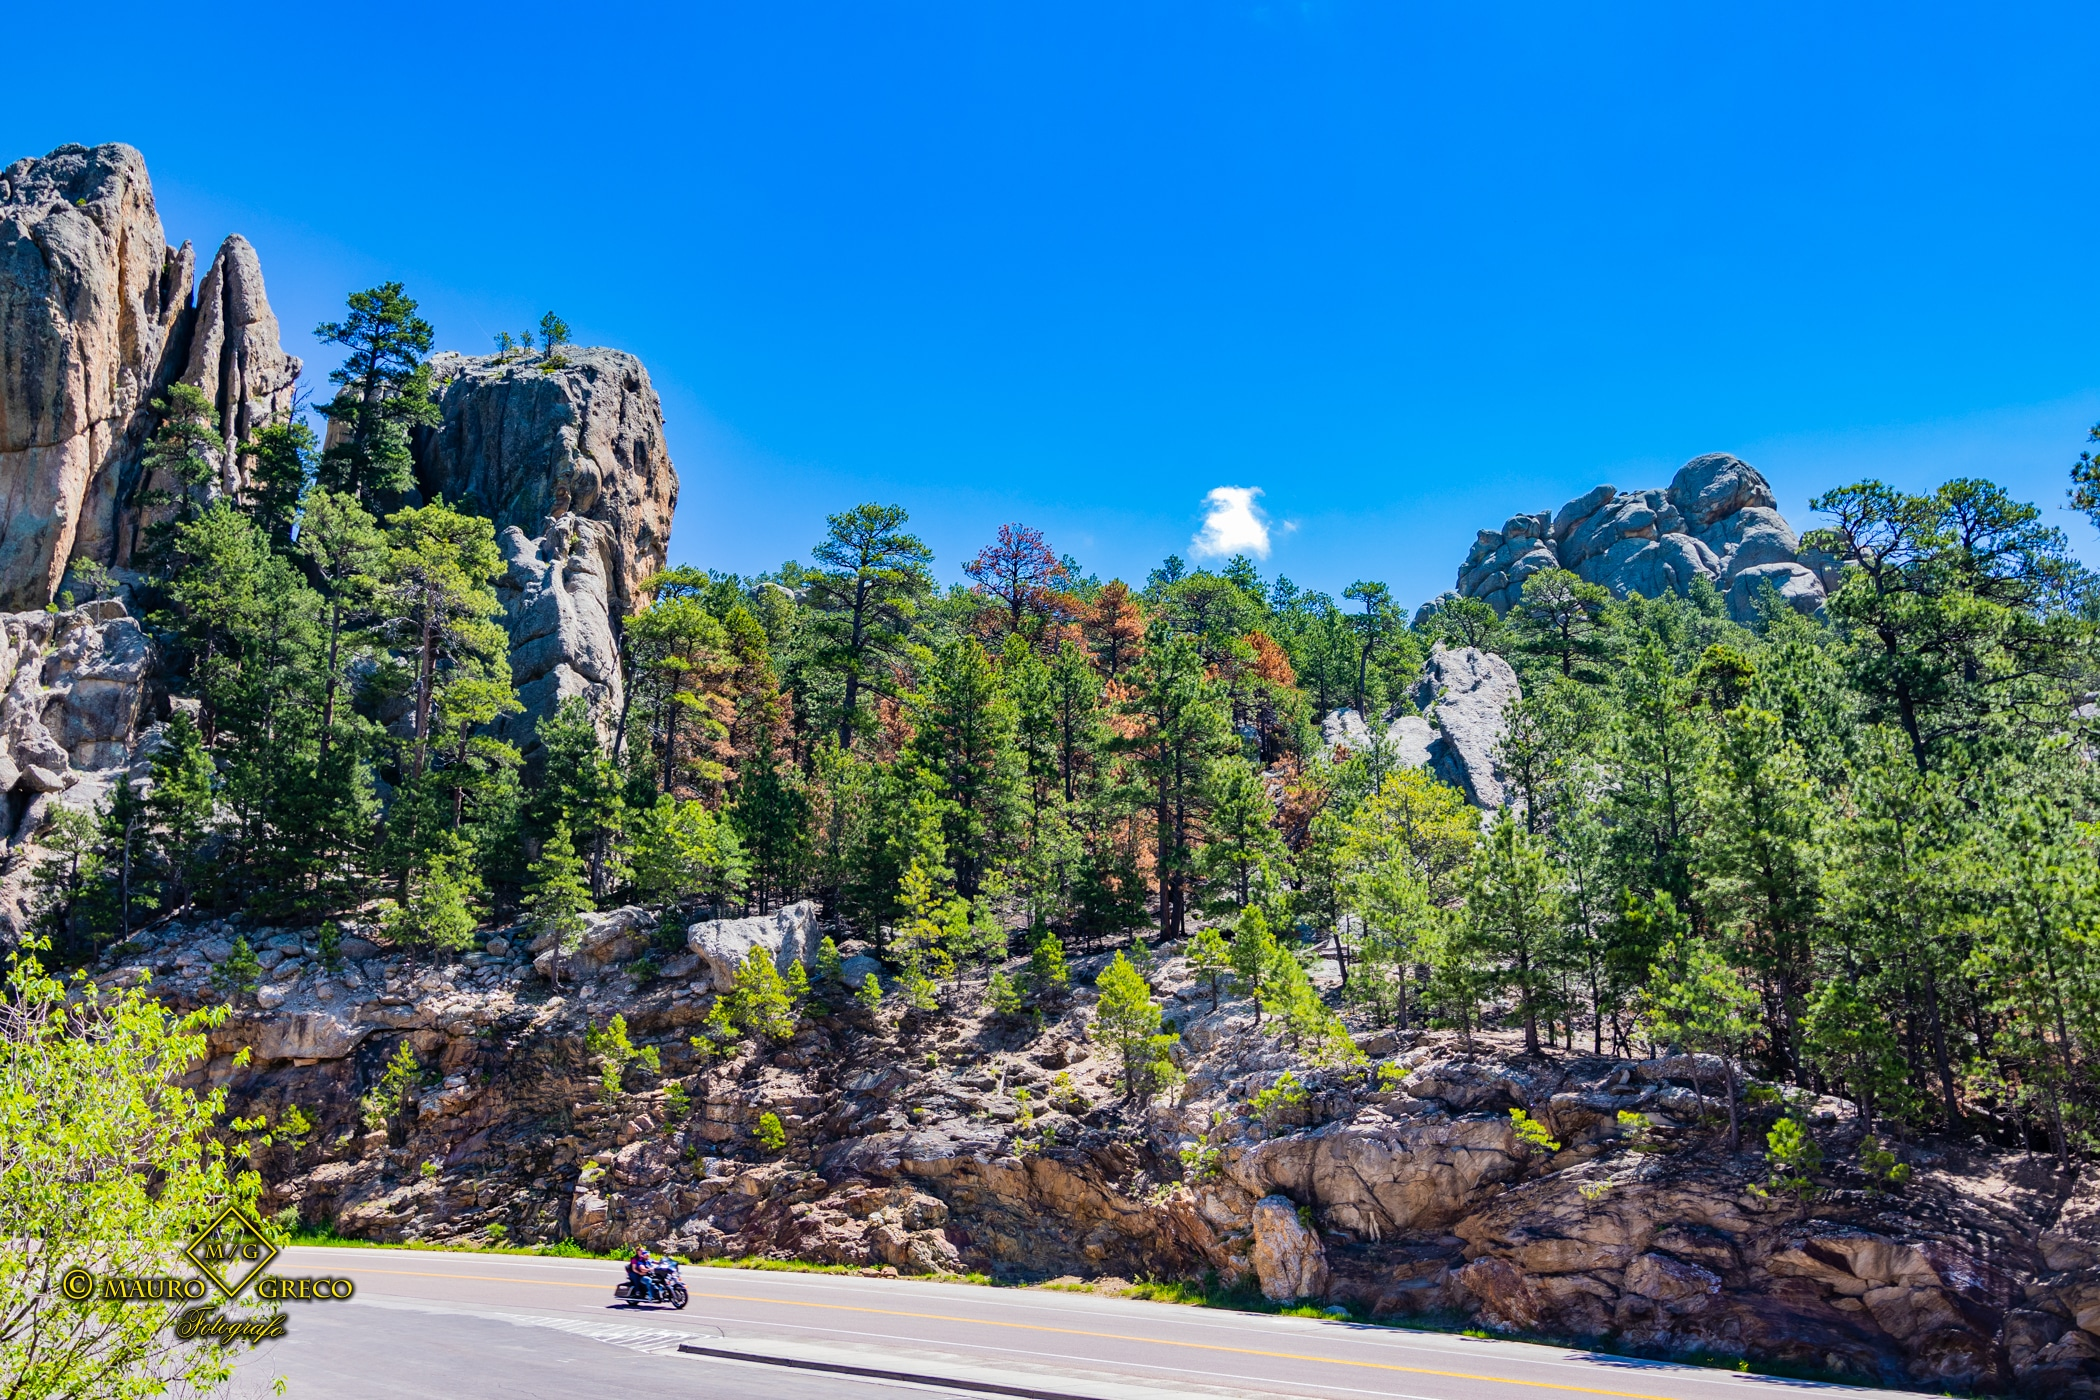 Caster South Dakota 2020 Tornado Moto Tour Viaggi organizzati in moto negli USA Monument Valley